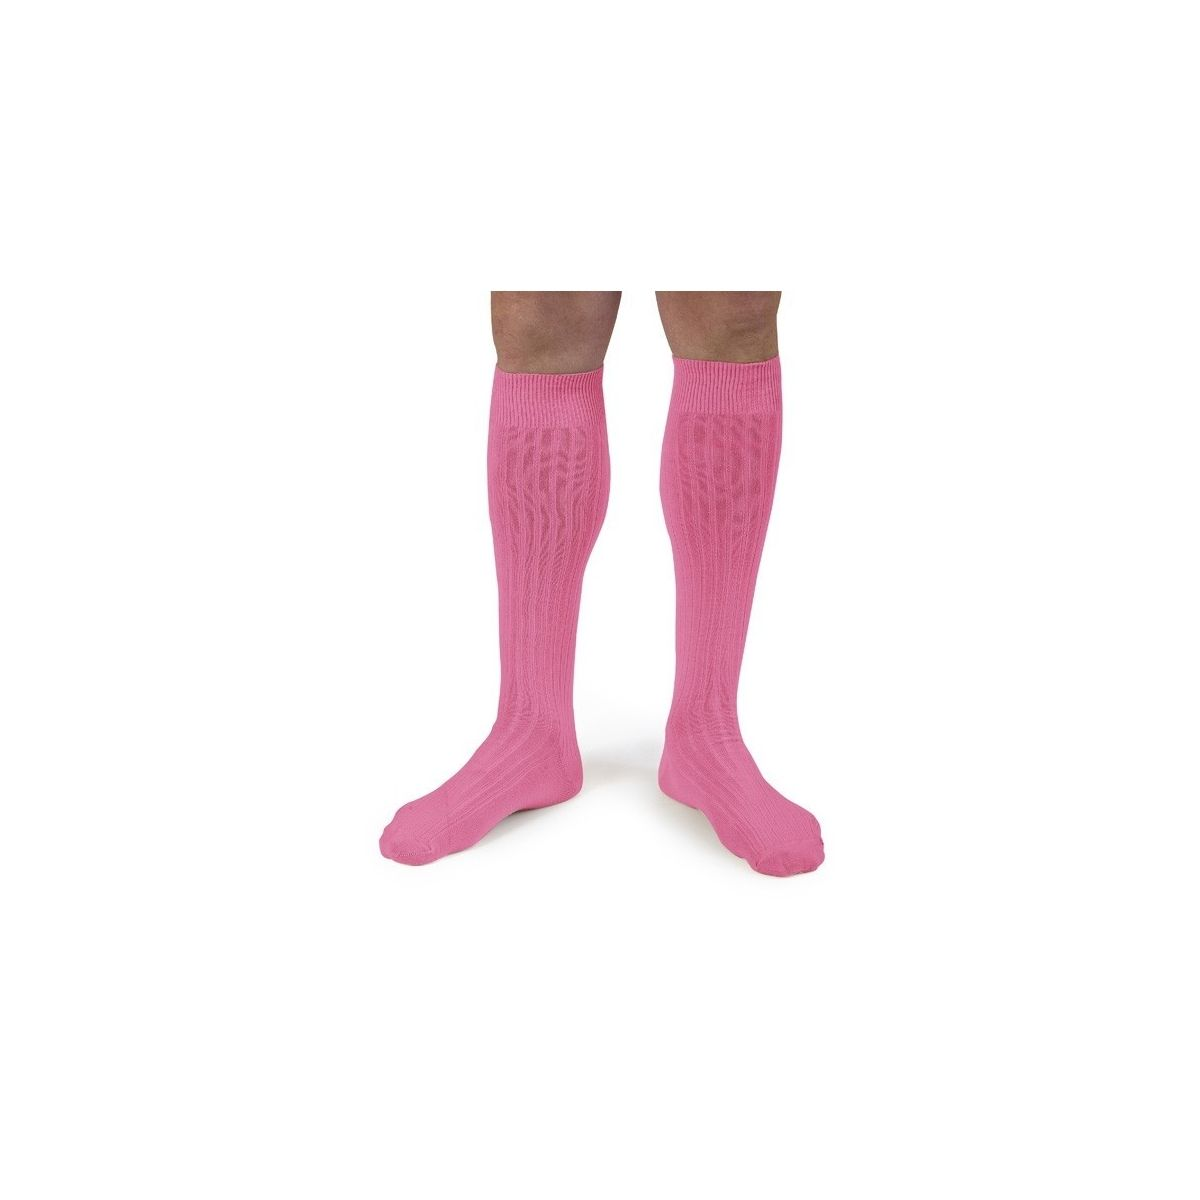 Collégien Kneesocks Rose fluo neon pink